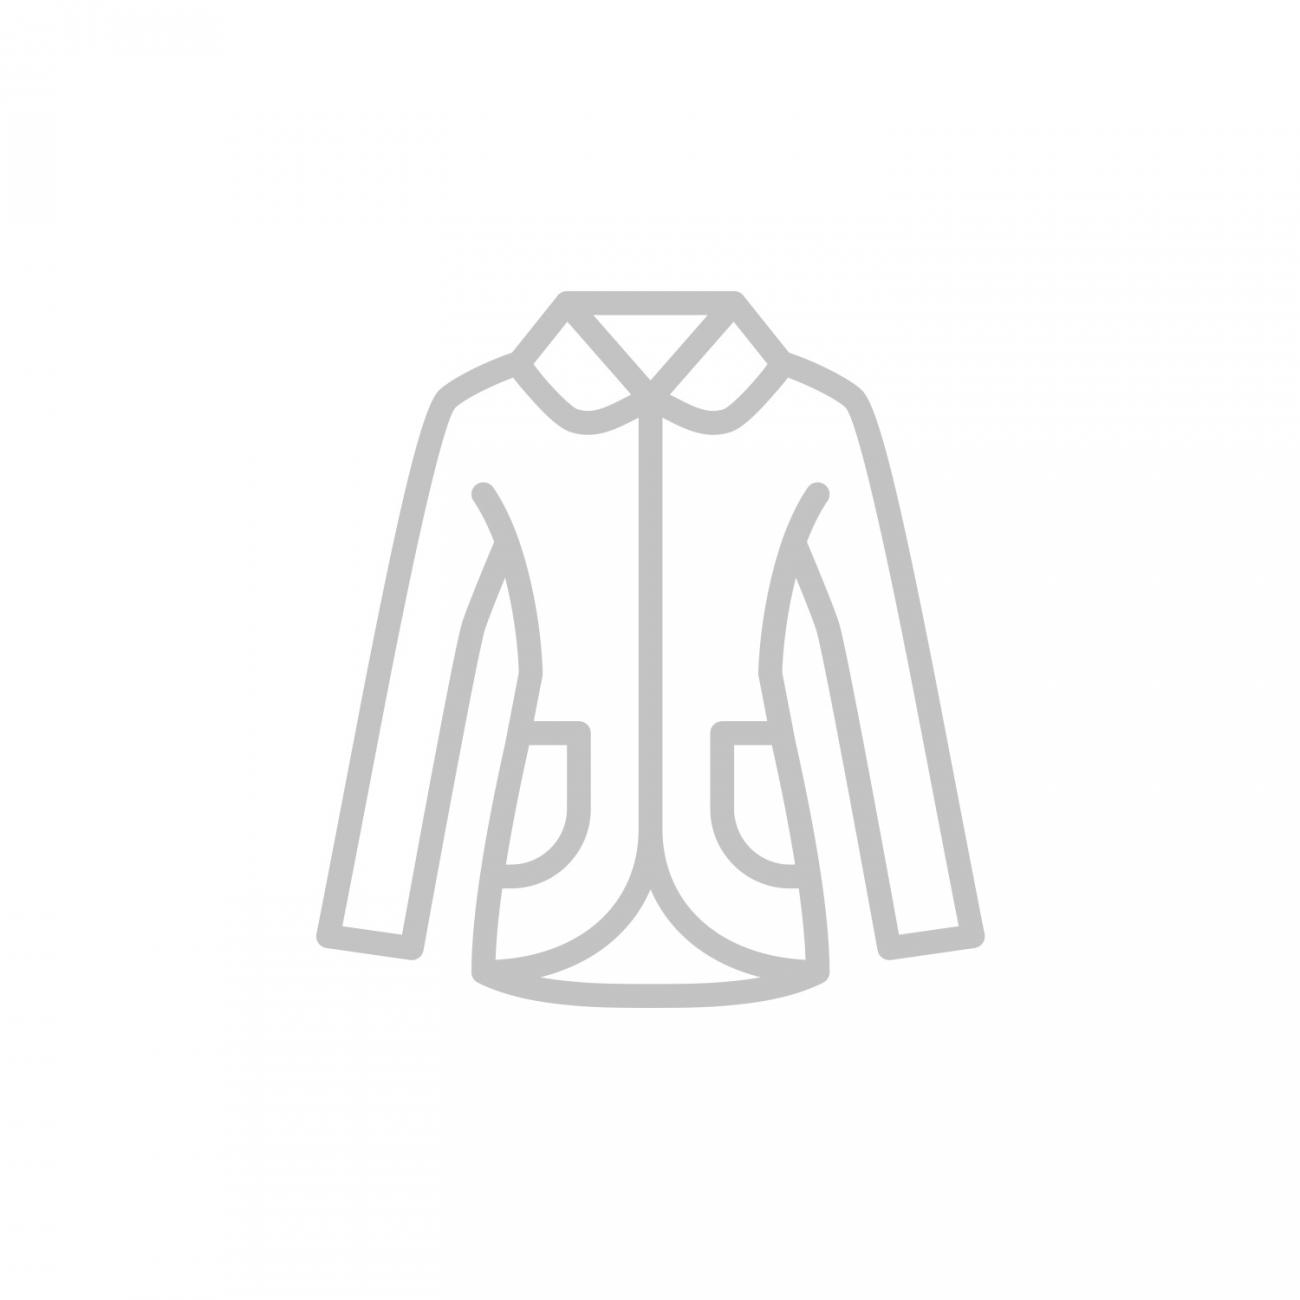 Nachthemd mit Motivdruck helles lavendel | 36